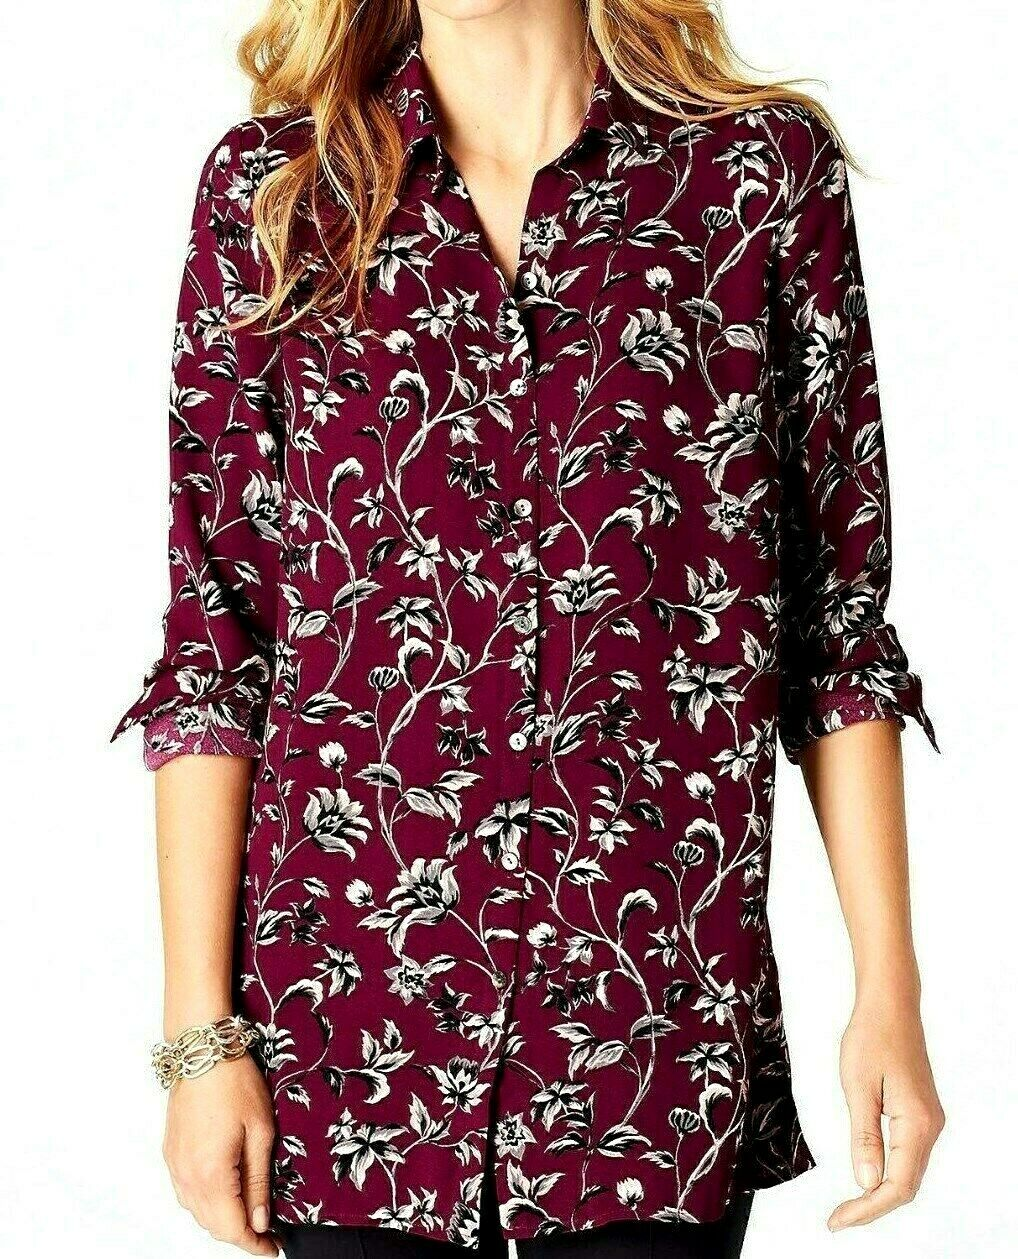 J Jill Top XL Burgundy Red Floral Blouse Shirt Geblackus Relaxed NEW MayFit 1X 2X